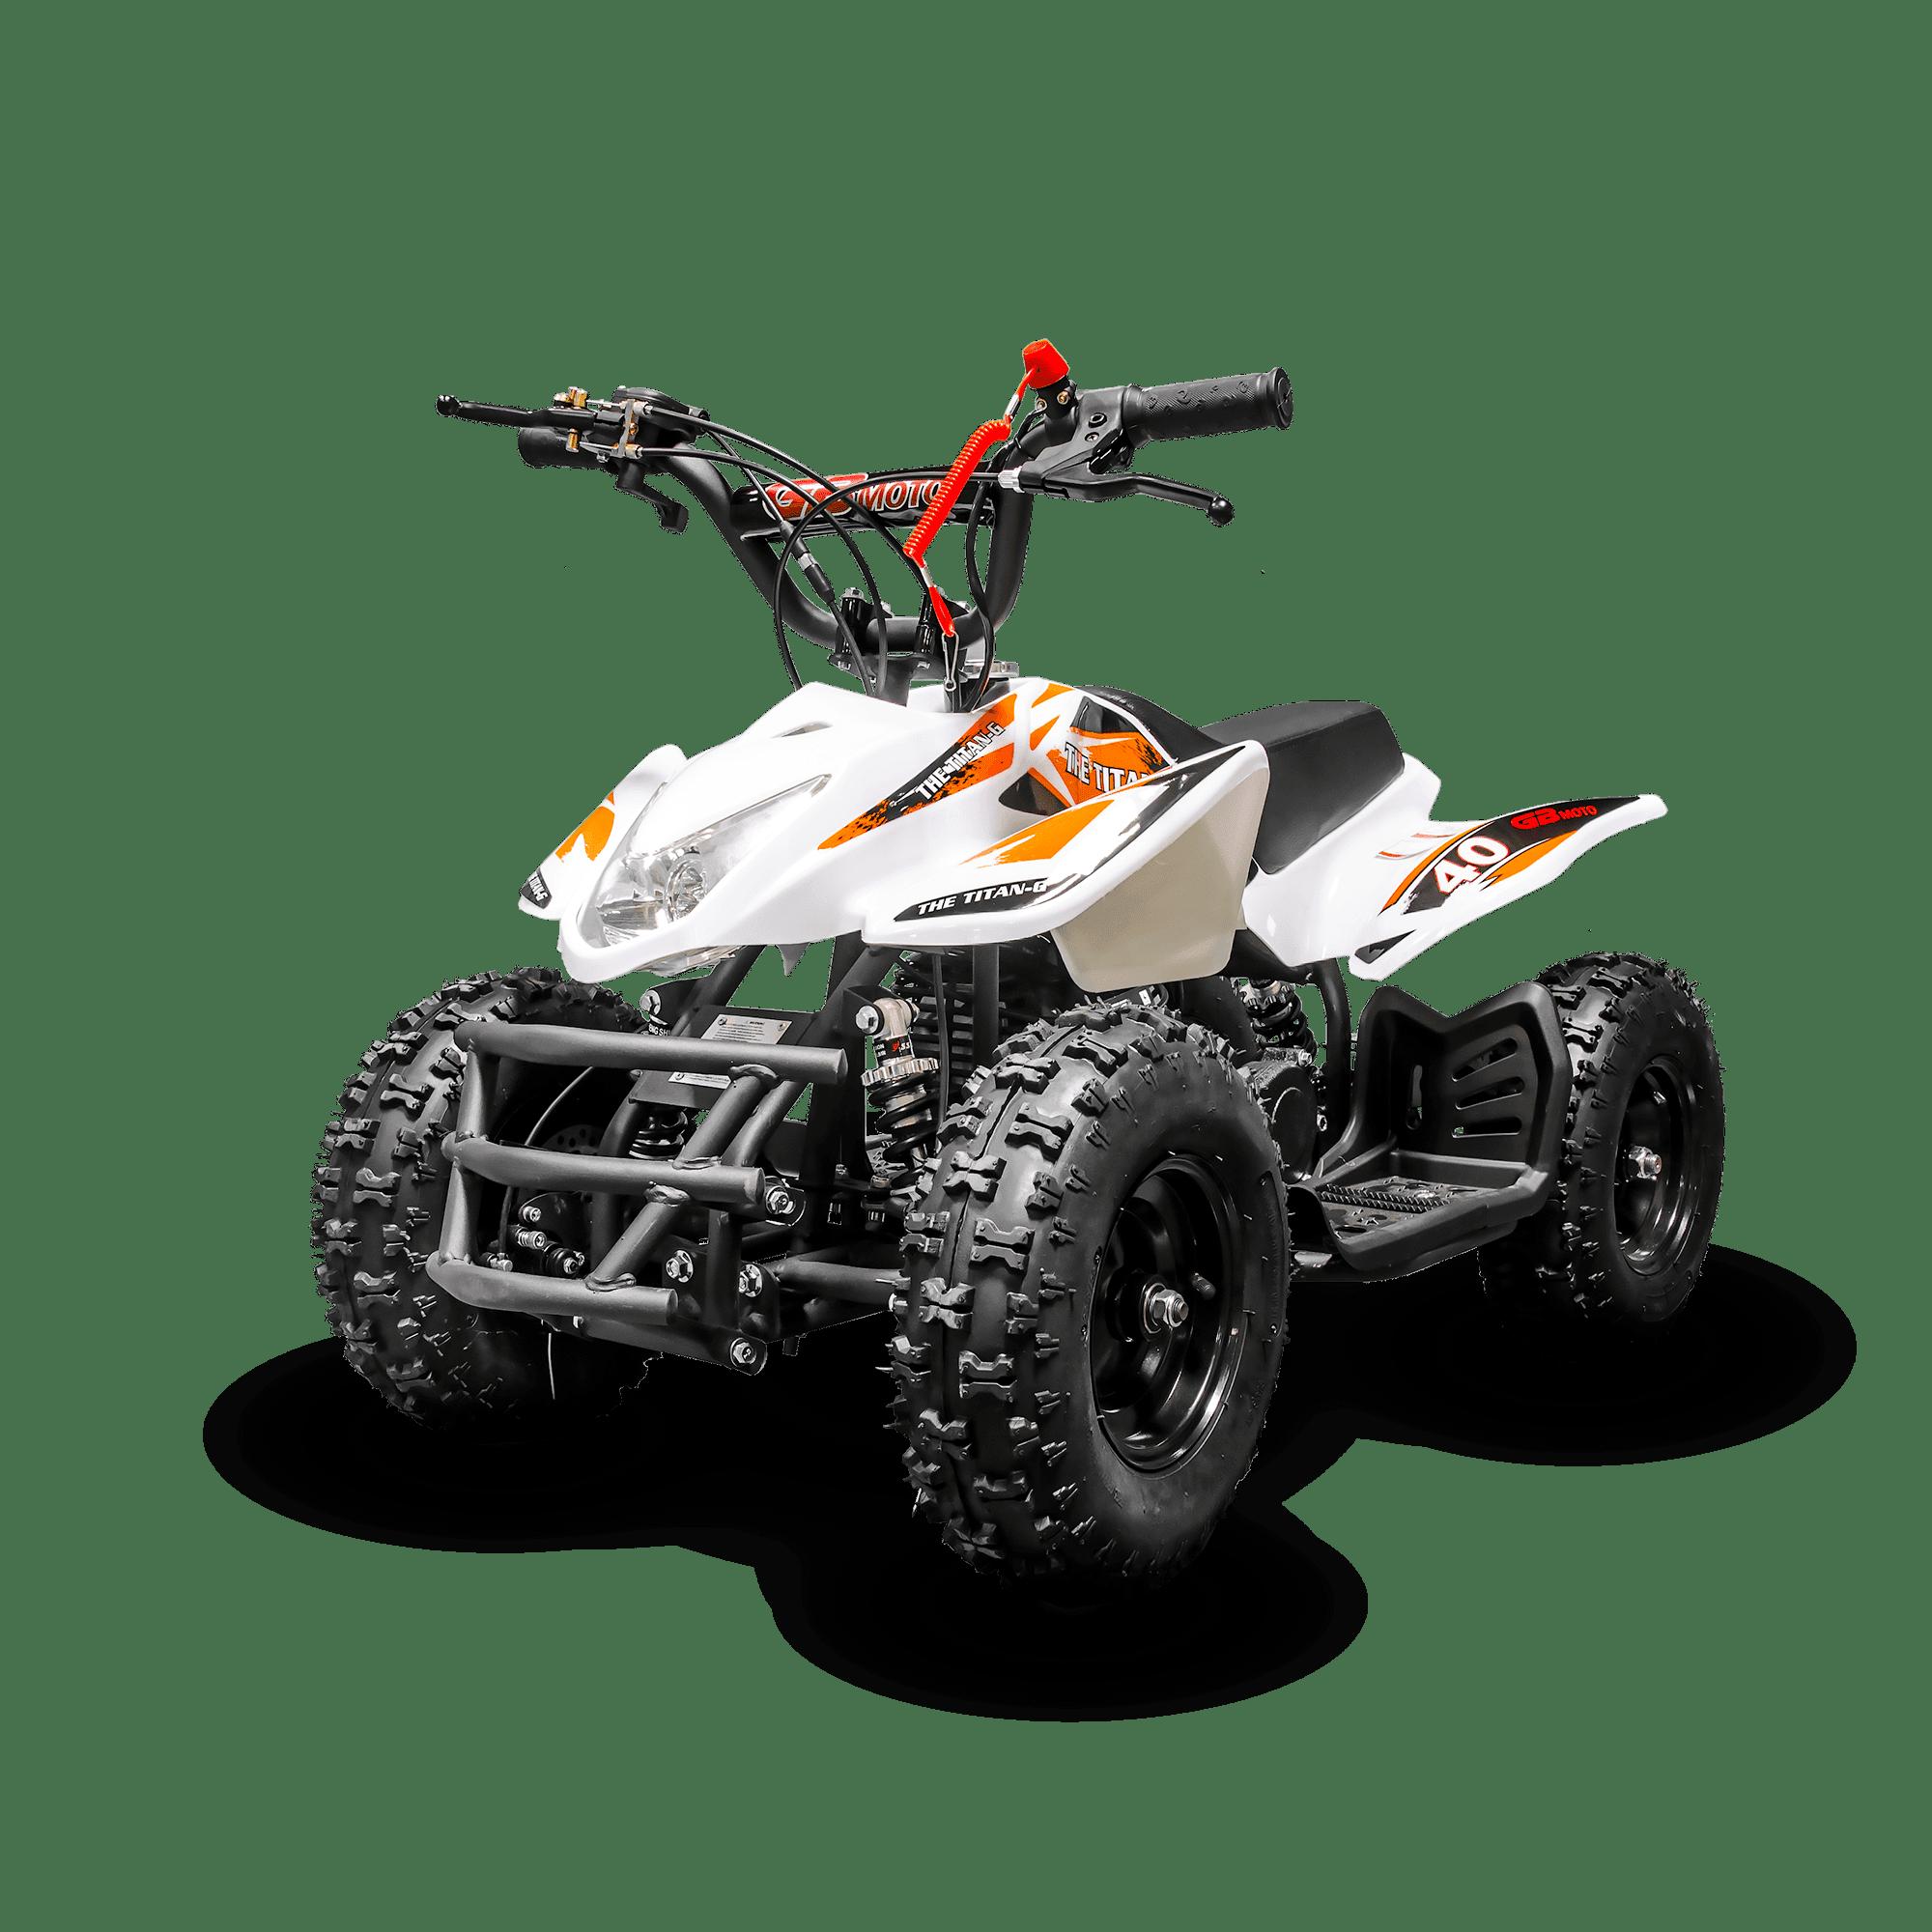 40cc 4 Stroke Gas Power Atv Off Road Mini Quad Titan For Kids Orange Walmart Com Walmart Com